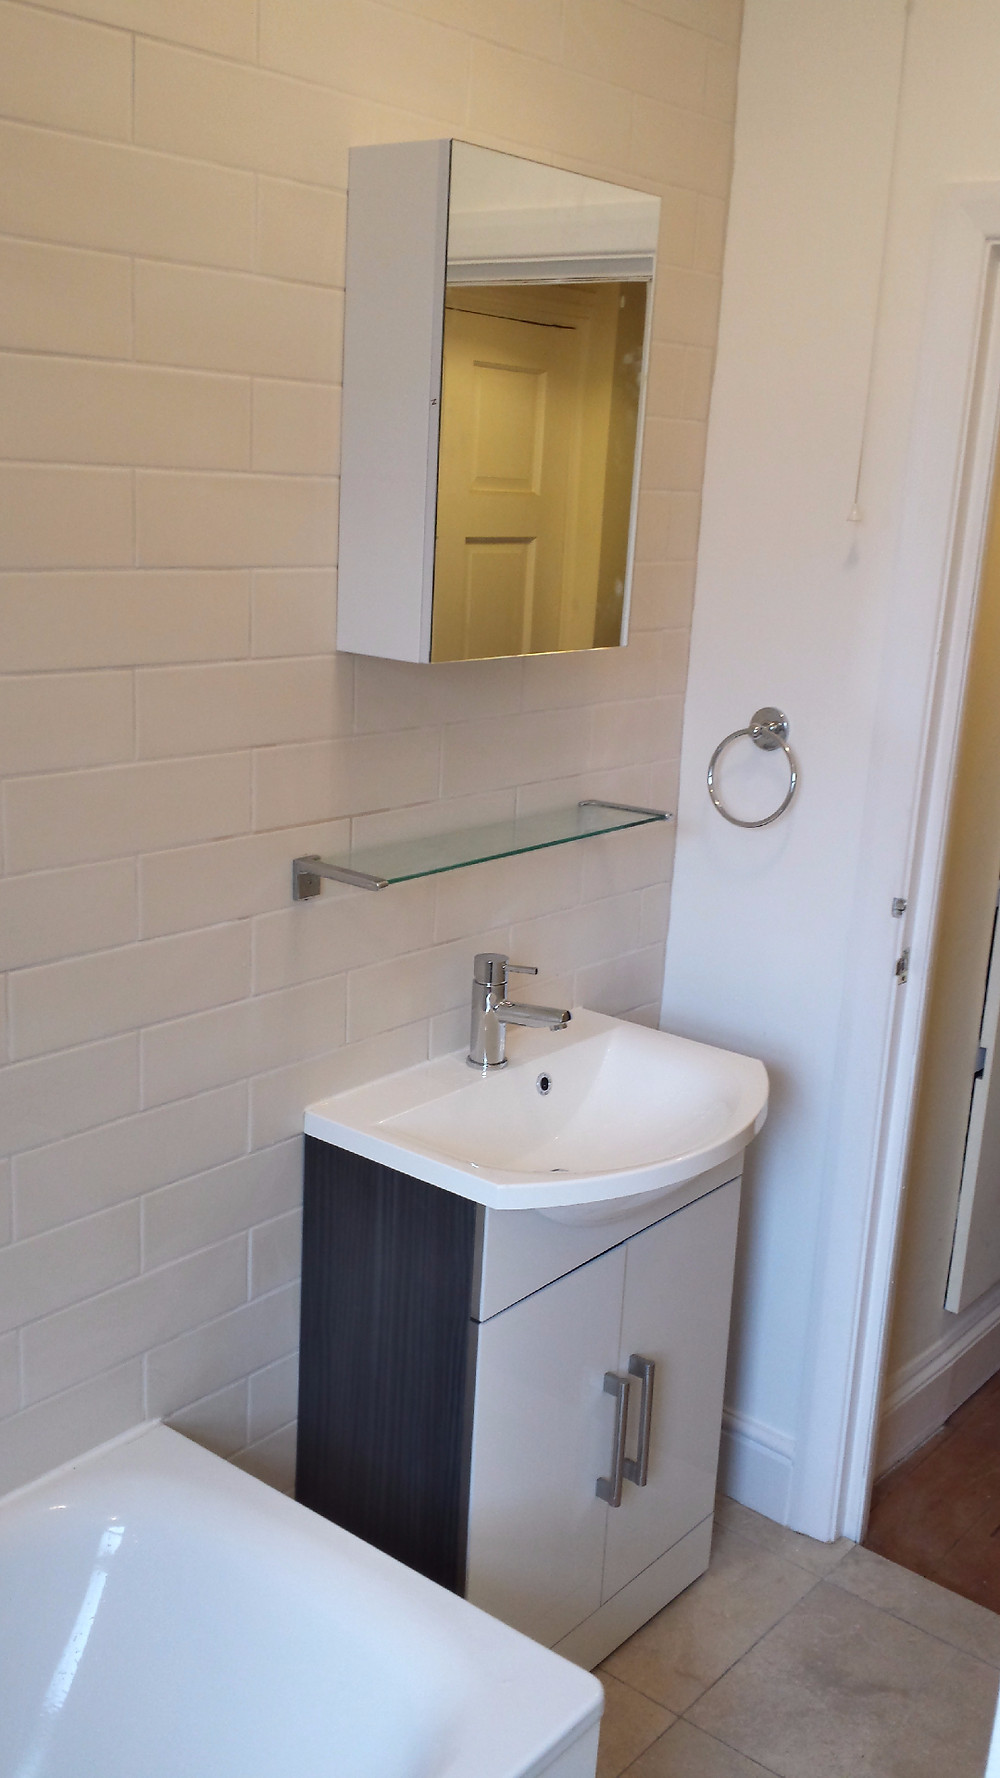 Fix Bathroom Wall Mirror Cabinet